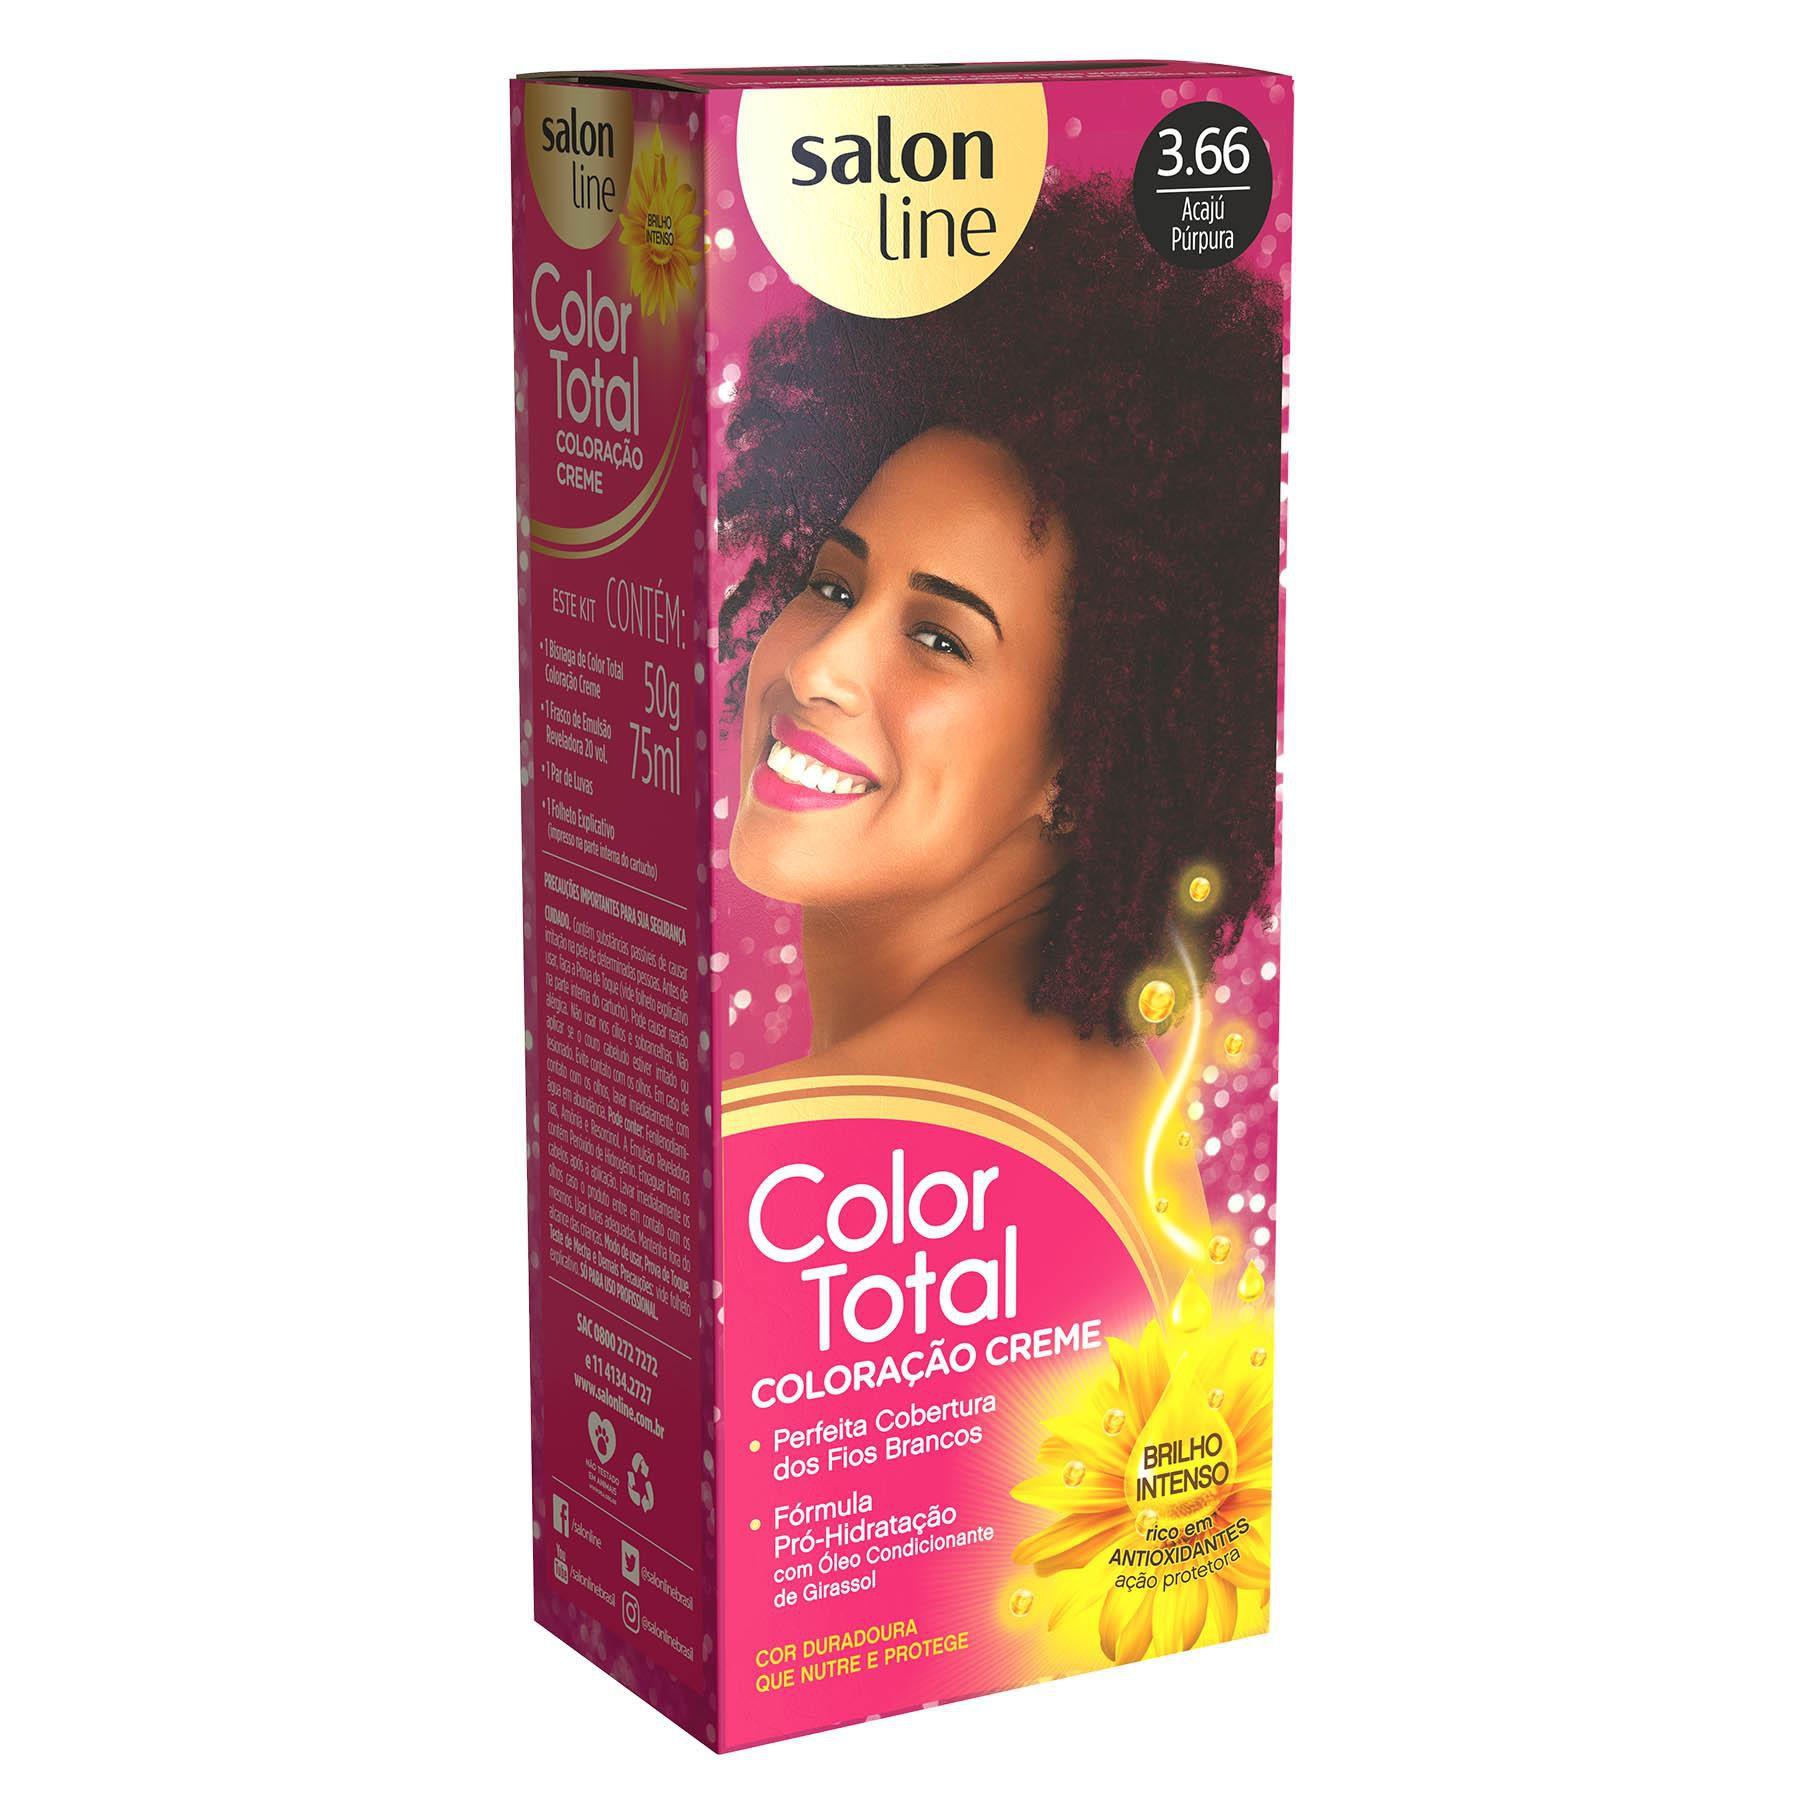 Salon Line Coloração Color Total 3.66 Acaju Purpura